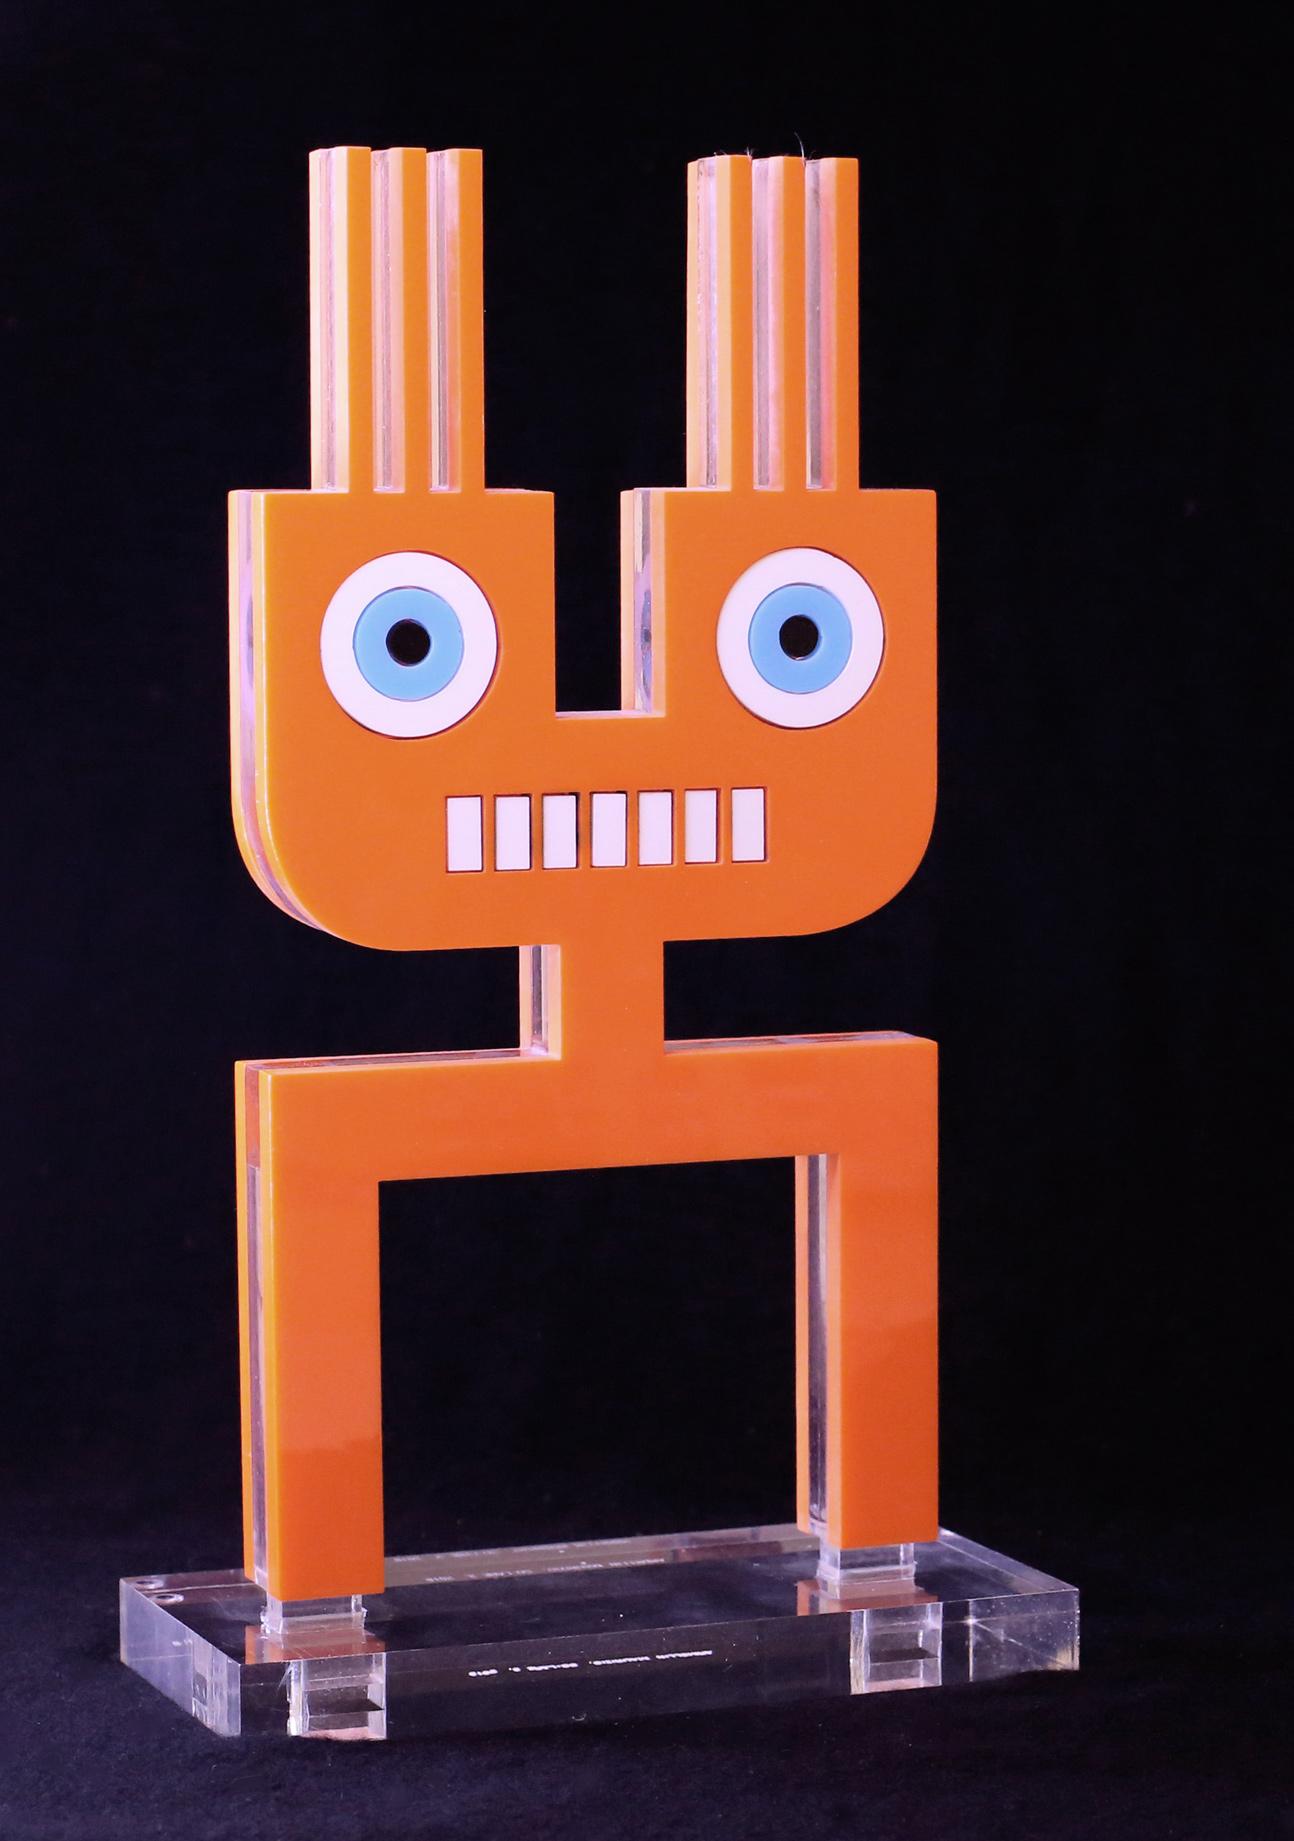 Maurizio Armellin, Spinottino, plexiglass, 21x39x9 cm, edition of 6